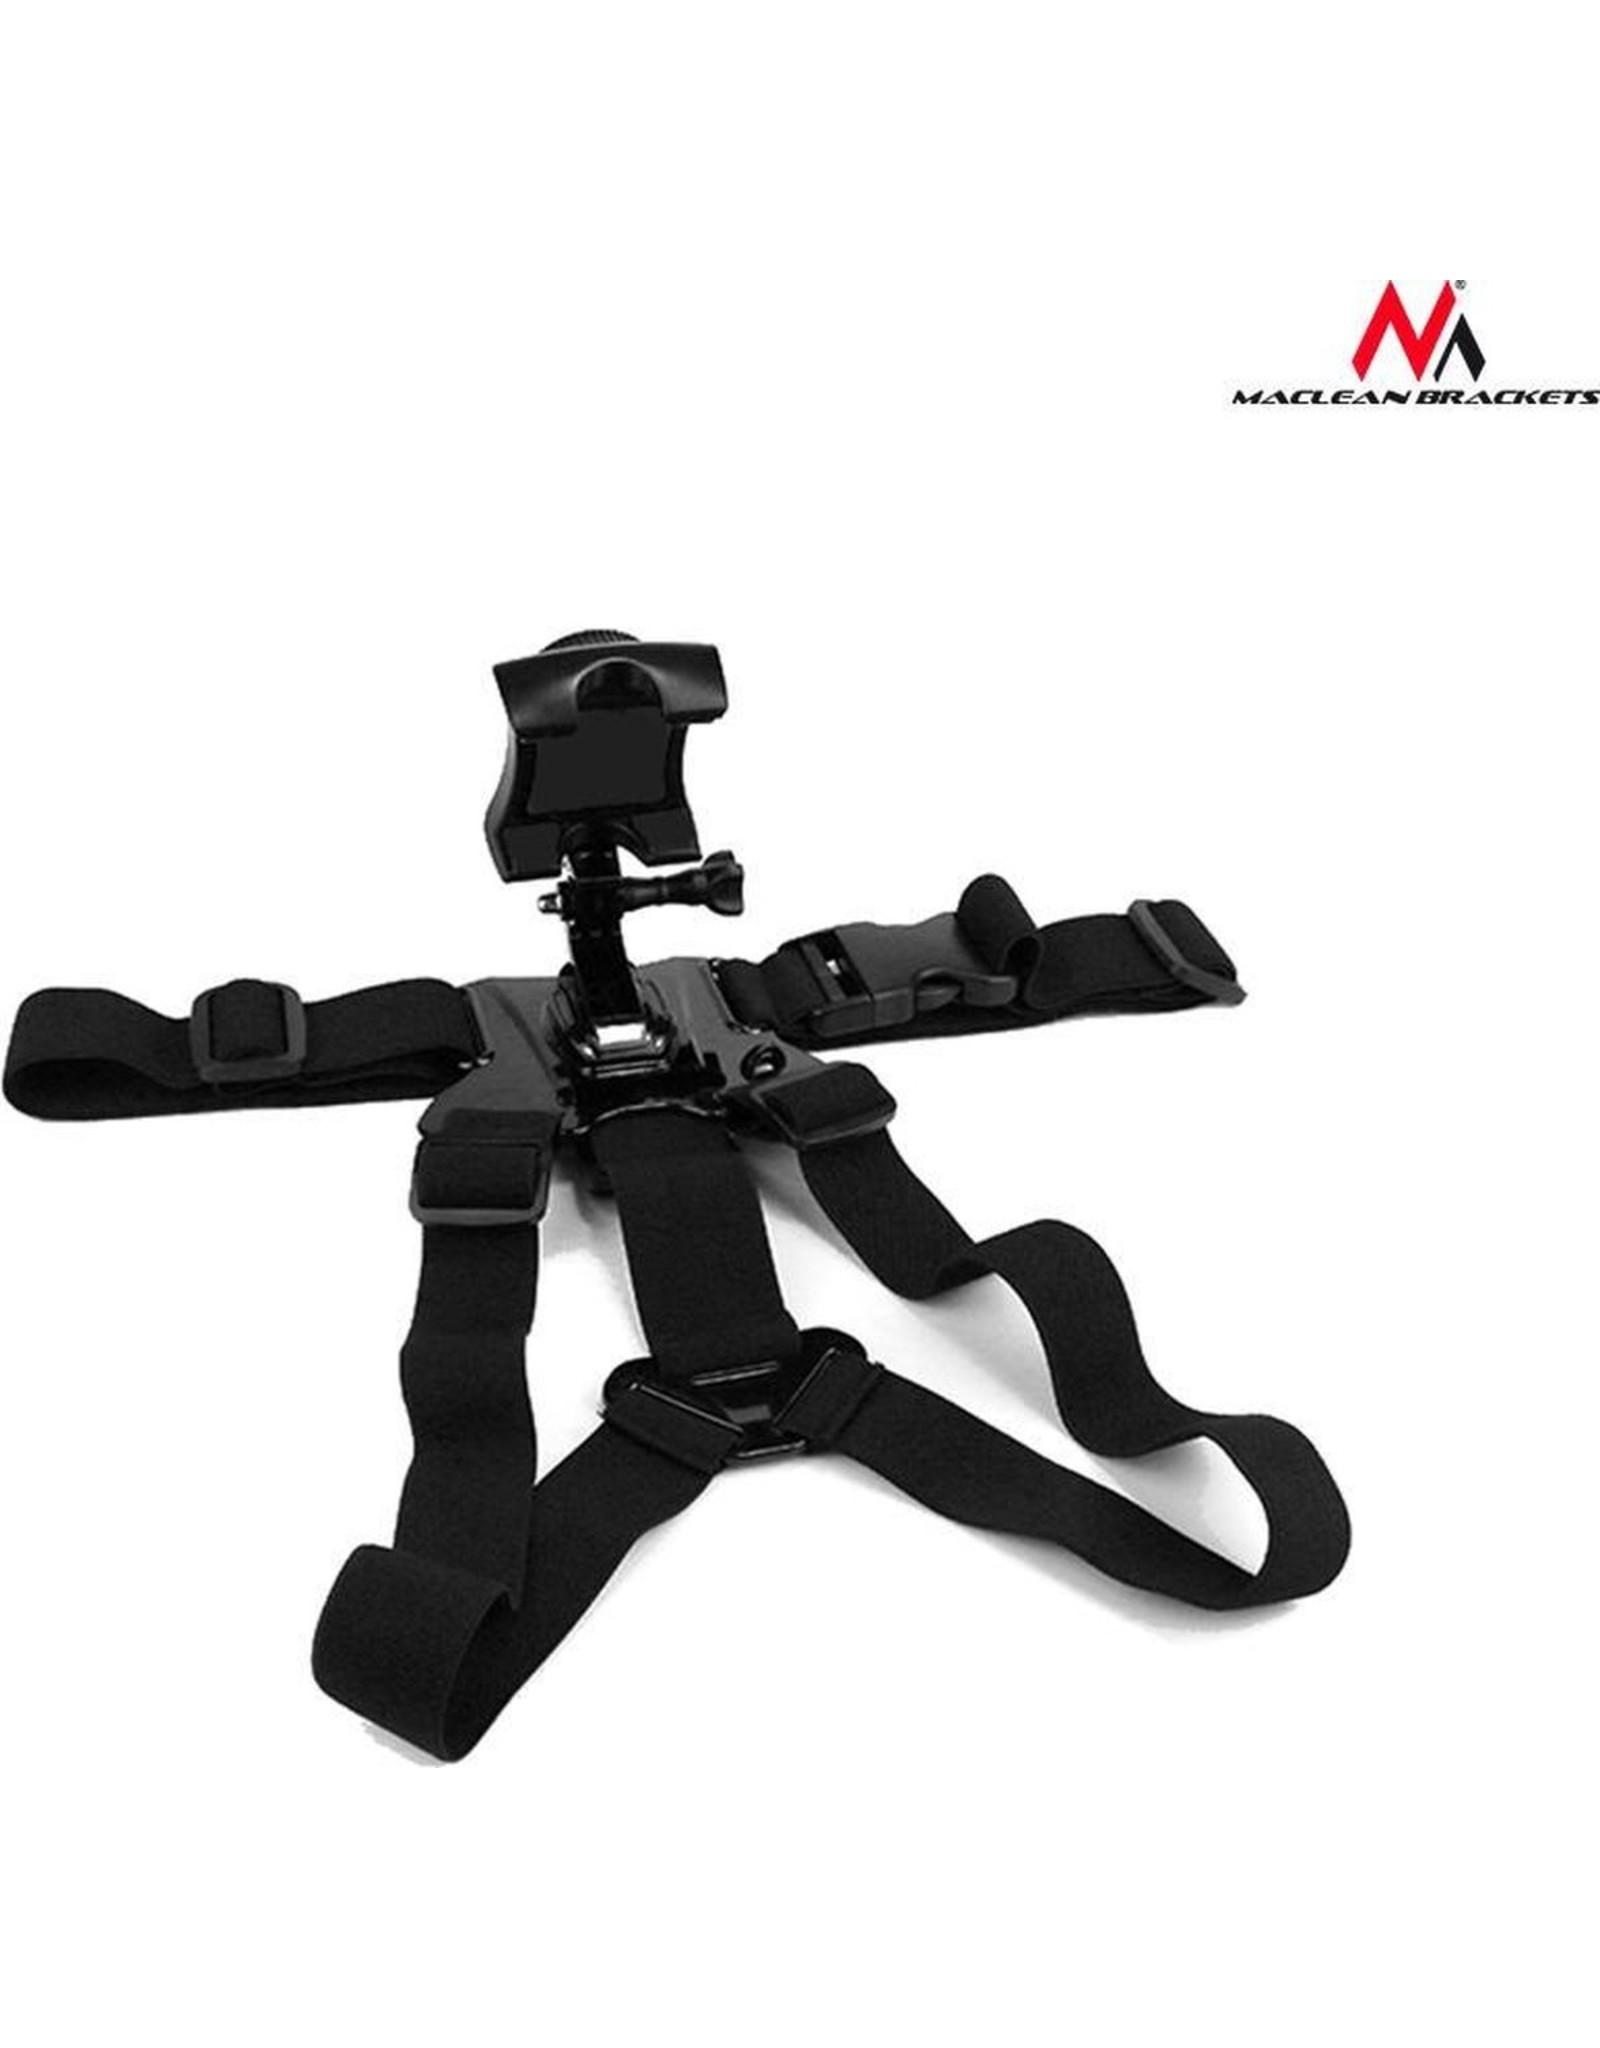 Maclean Maclean MC-773 - Borstband -  Mobiele Telefoon